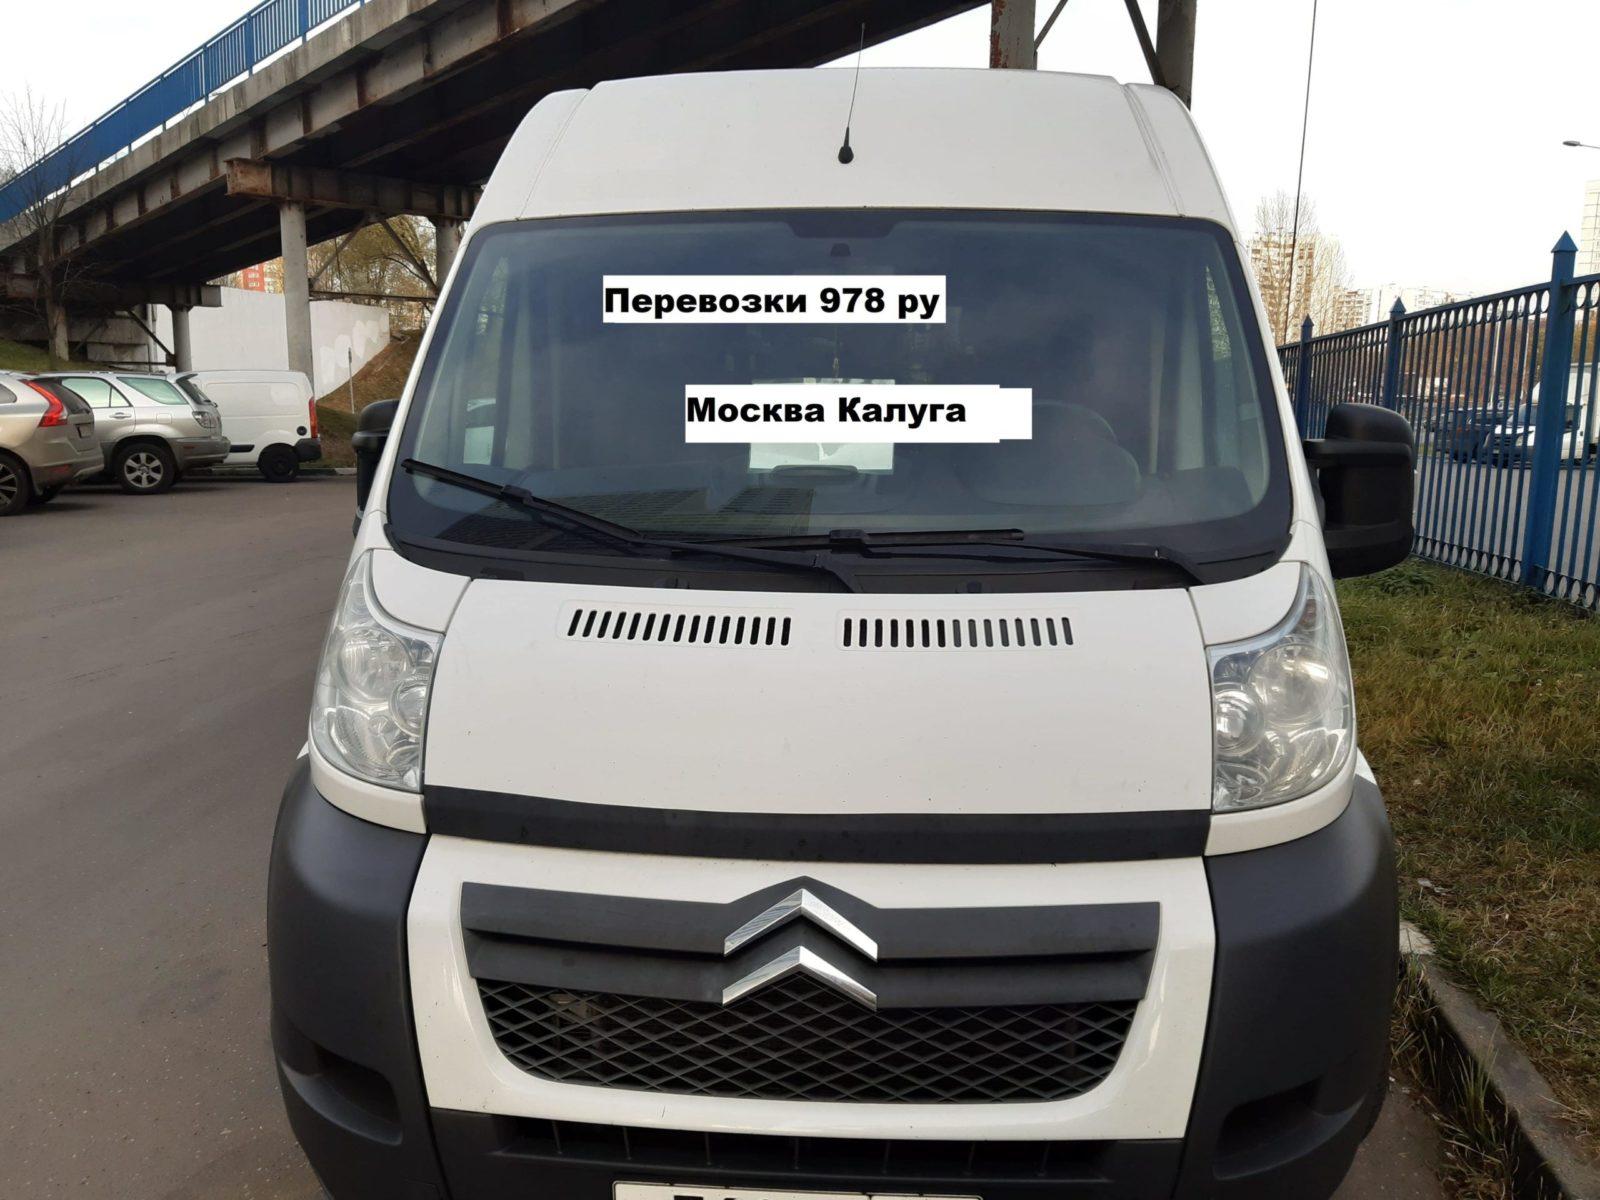 Грузопассажирские перевозки Москва Калуга | «Перевозки 978»